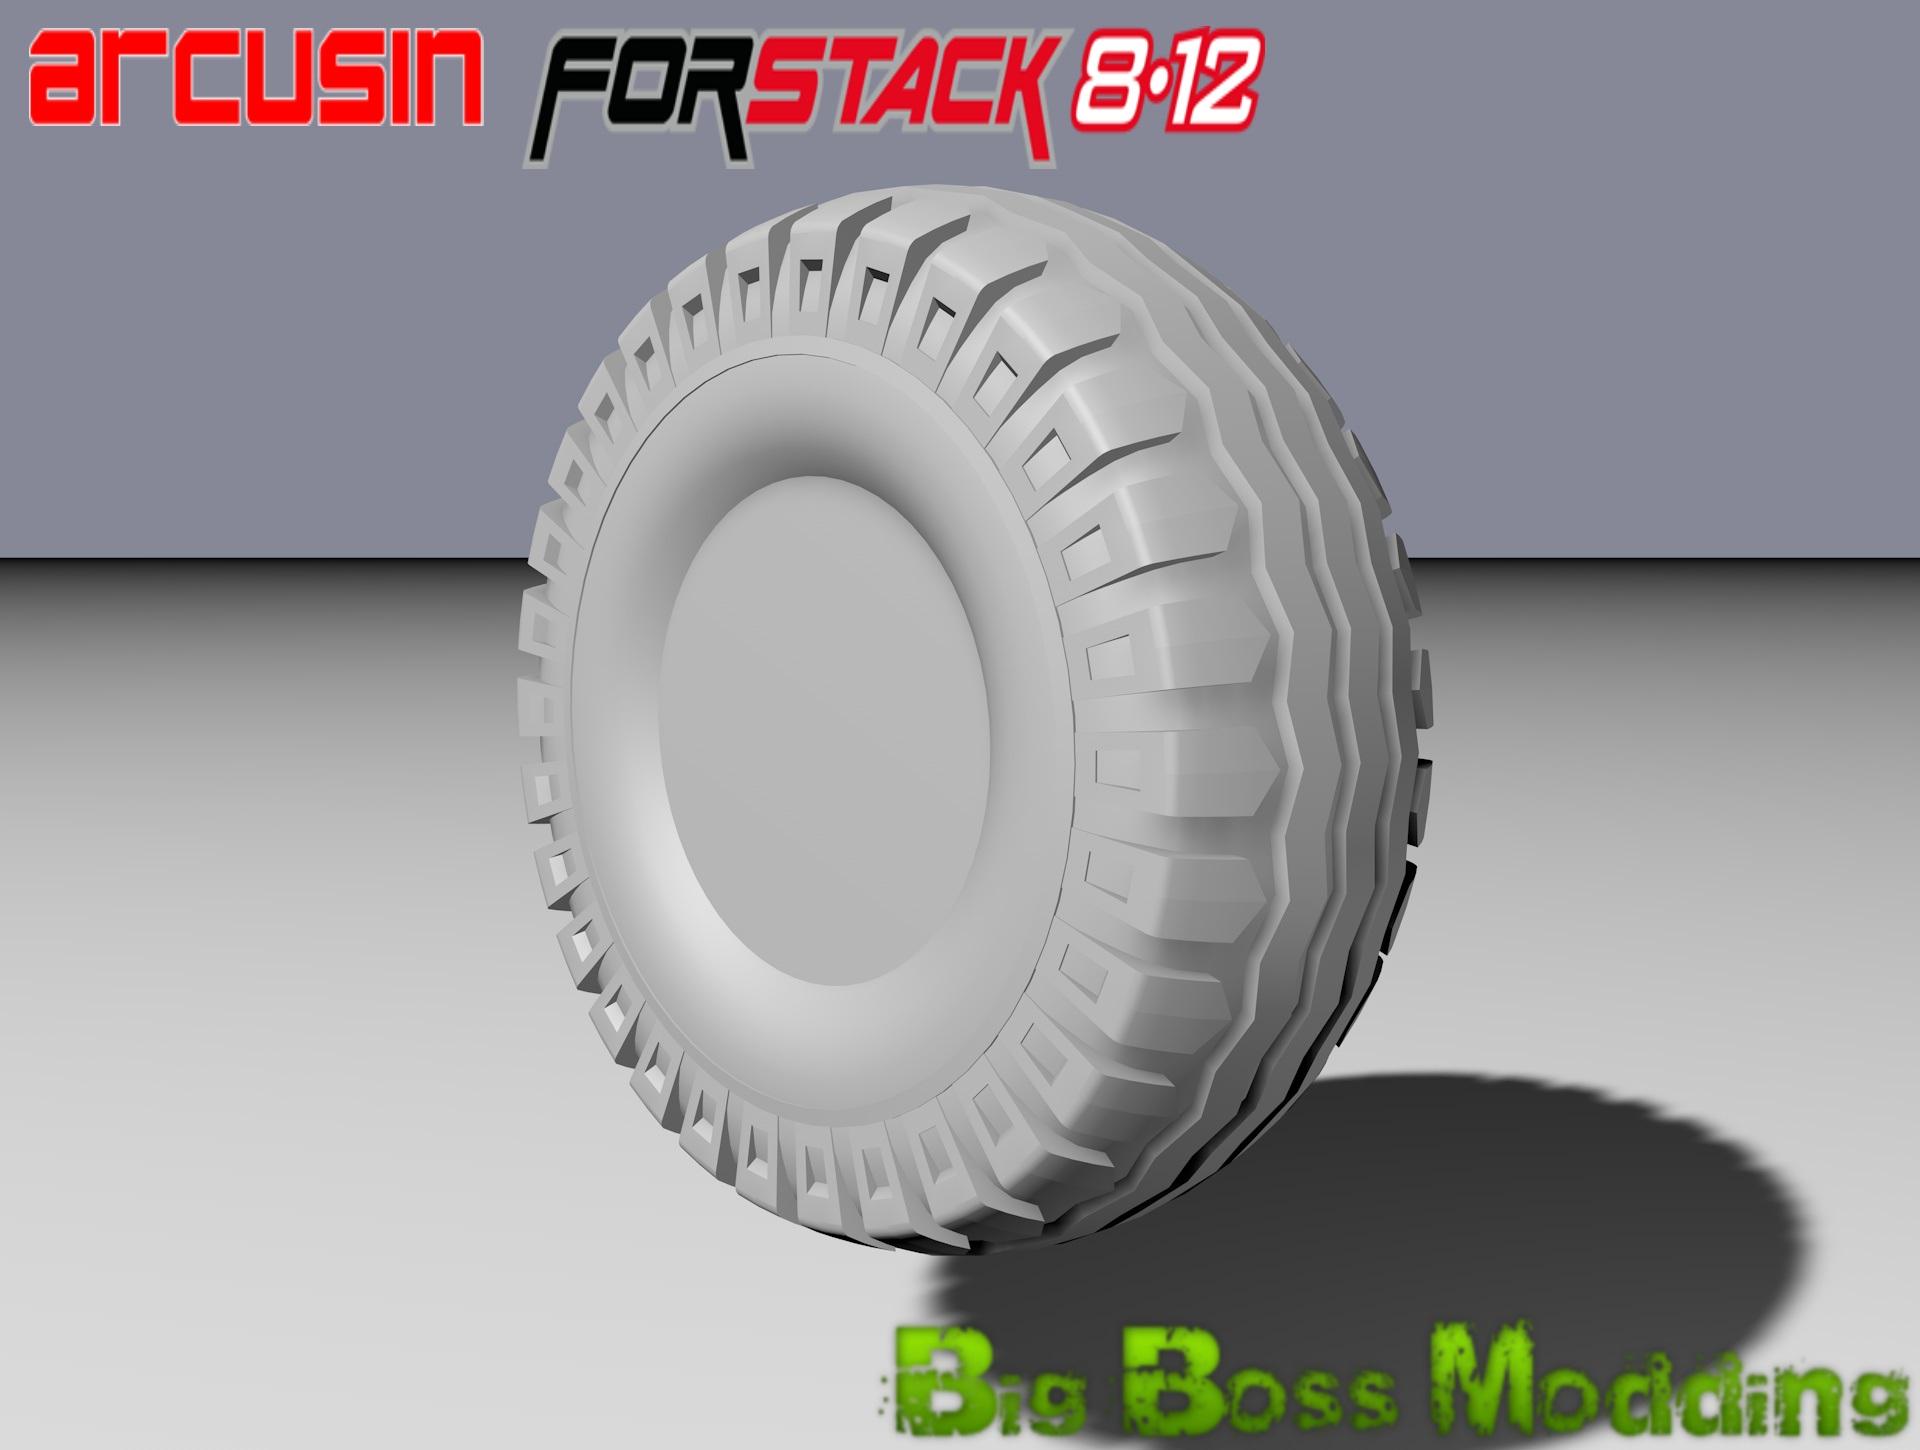 [T.E.P.] Arcusin ForStack 8-12 [Actualizado 30-5-2014] Rueda5verd